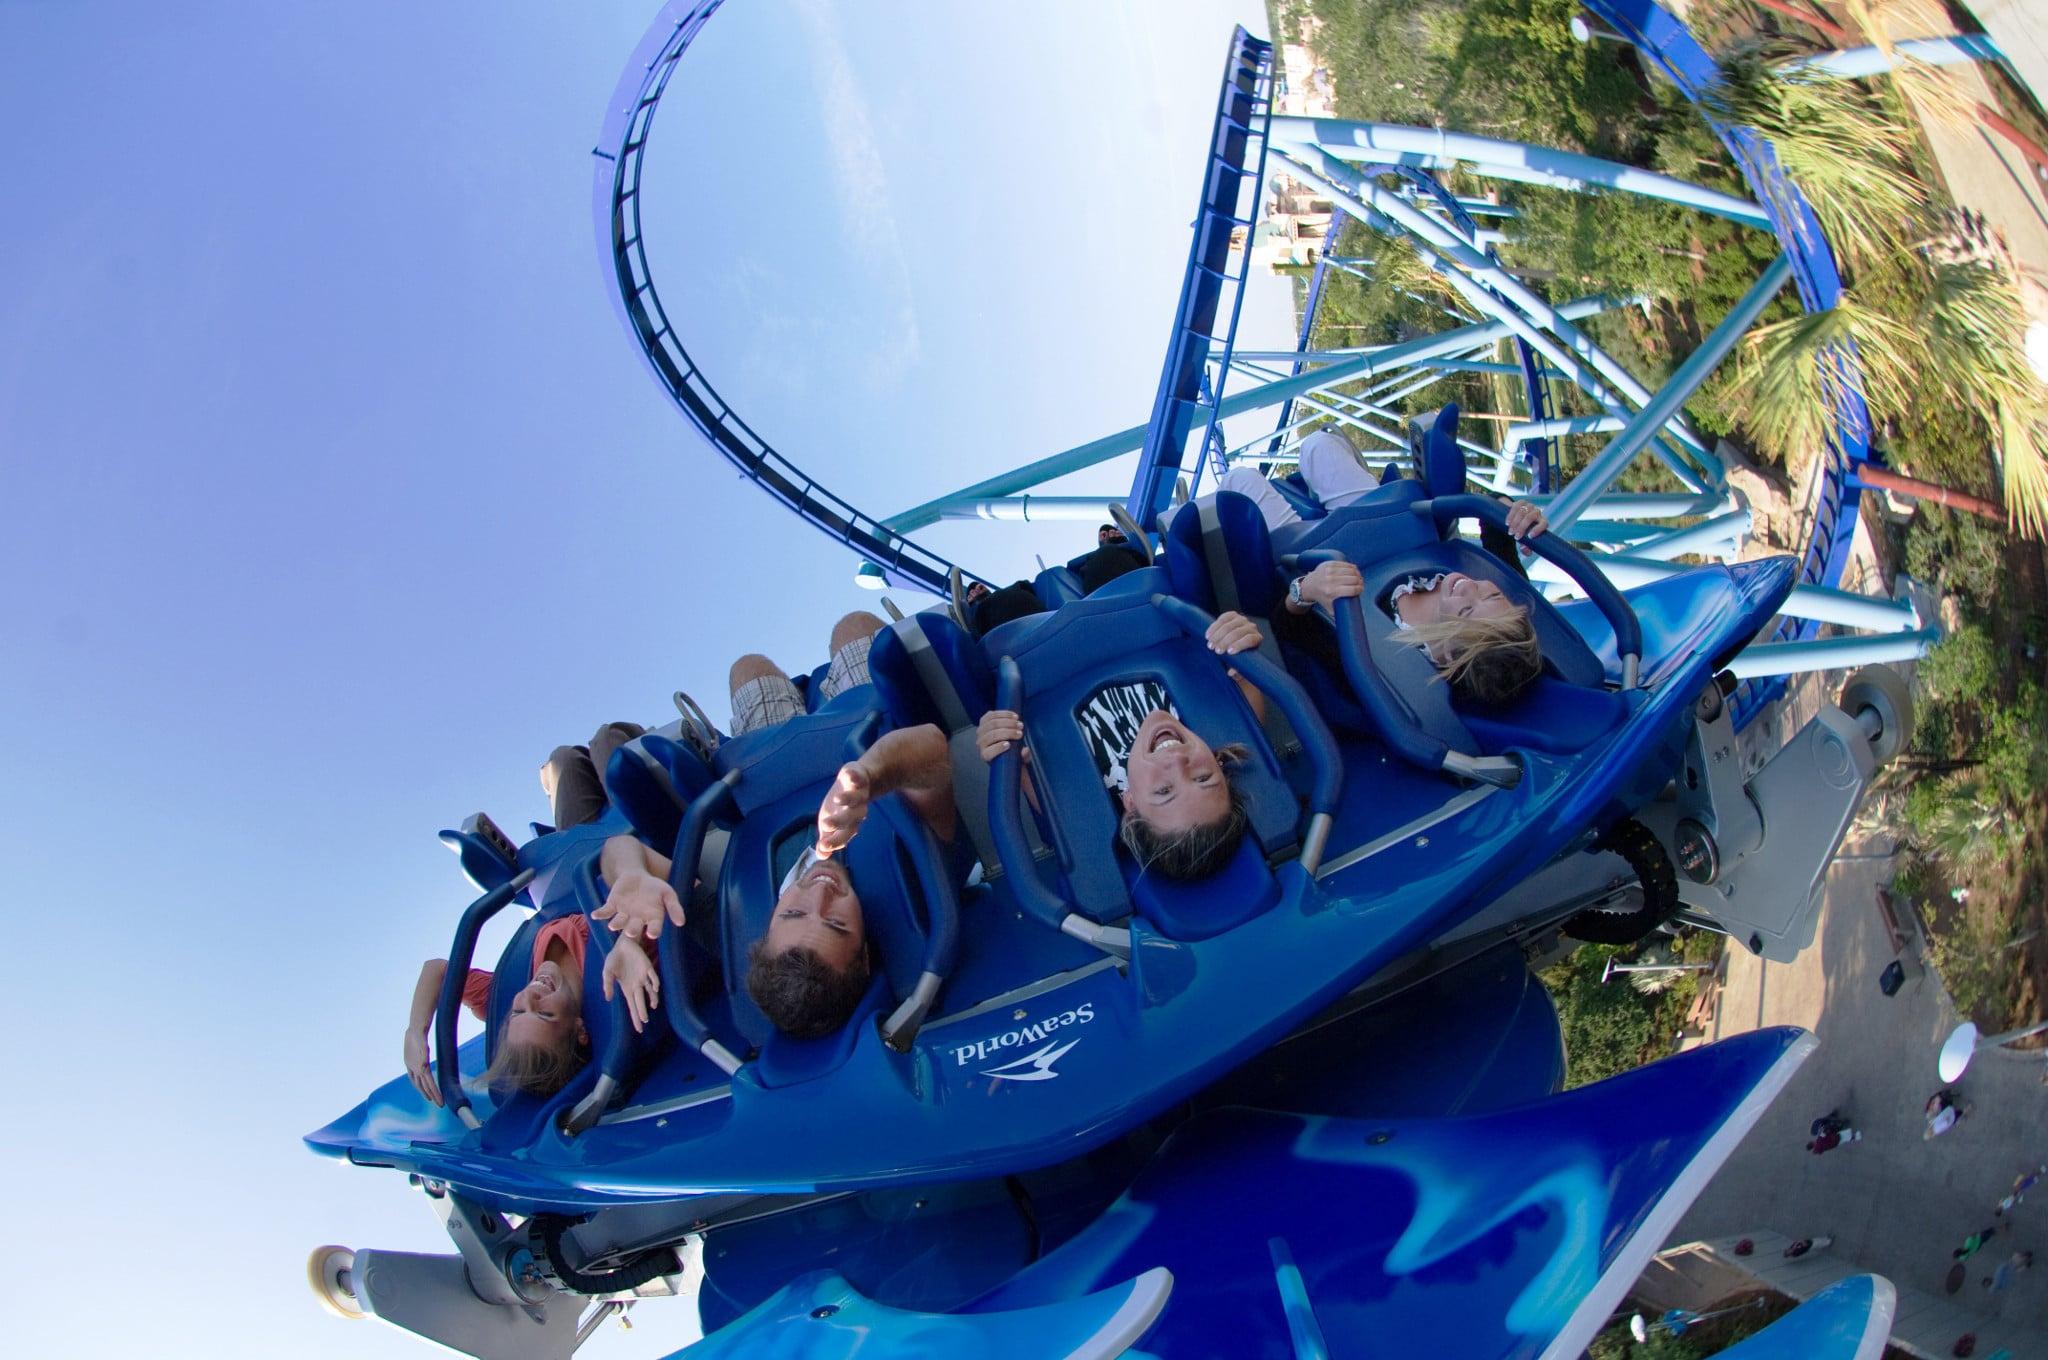 Riders enjoy Manta roller coaster at SeaWorld Orlando.